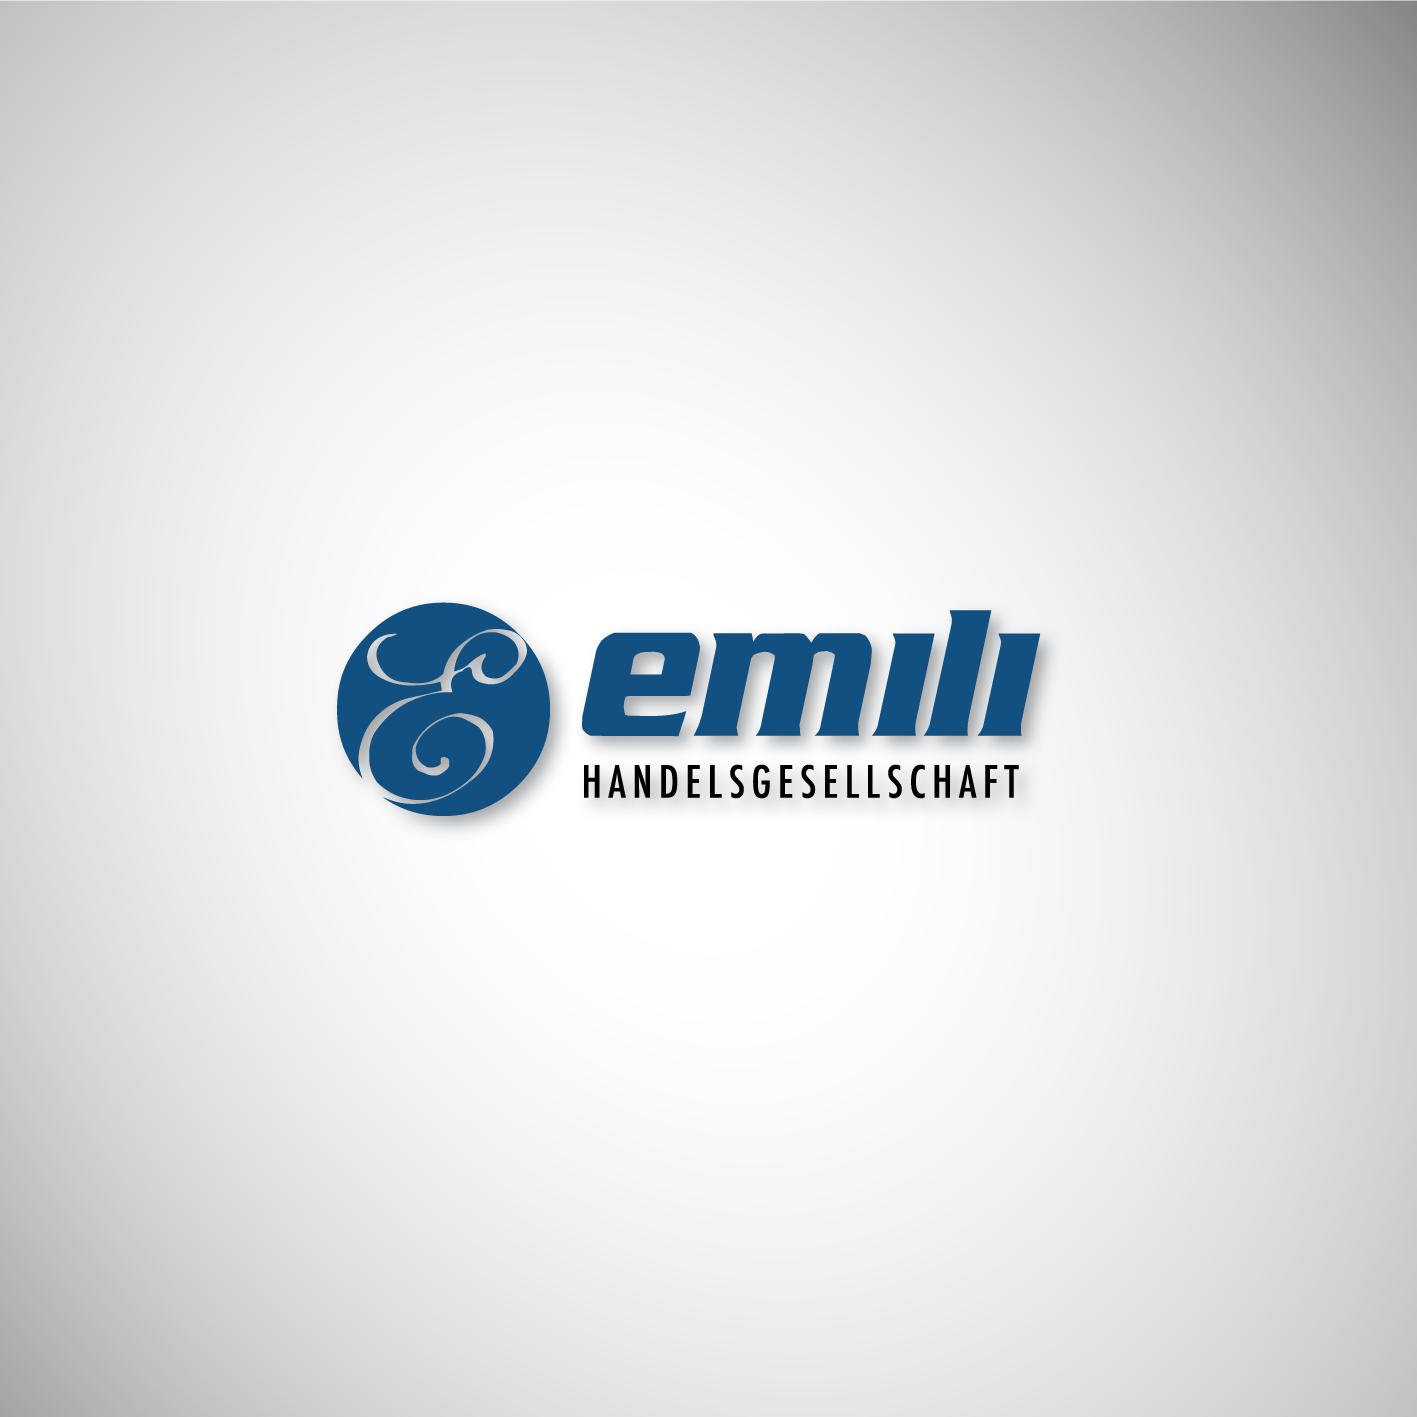 emili_hg